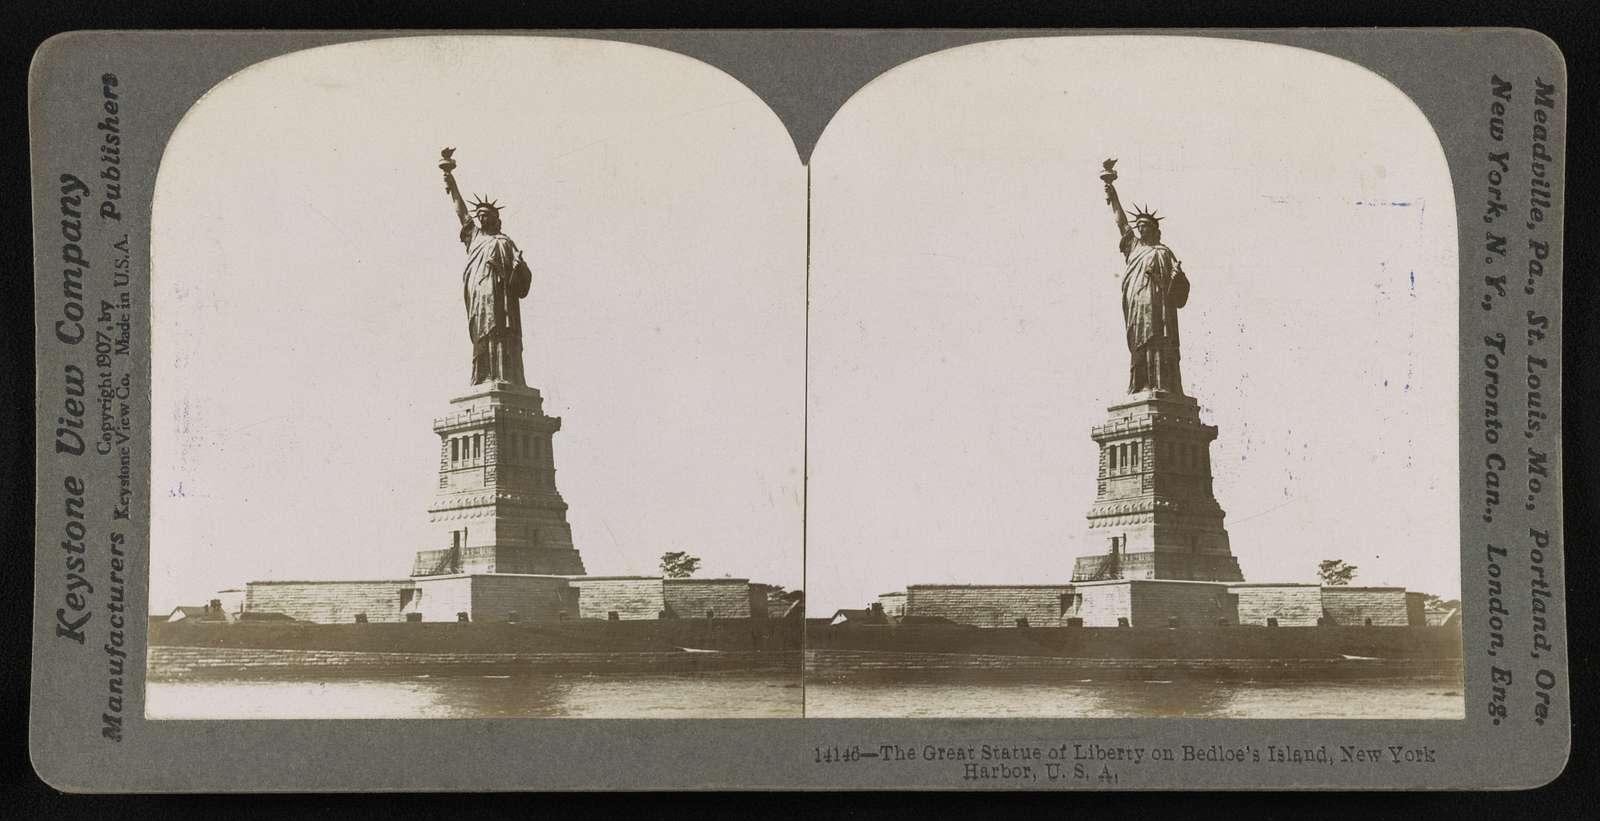 The great Statue of Liberty on Bedloe's Island, New York Harbor, U.S.A